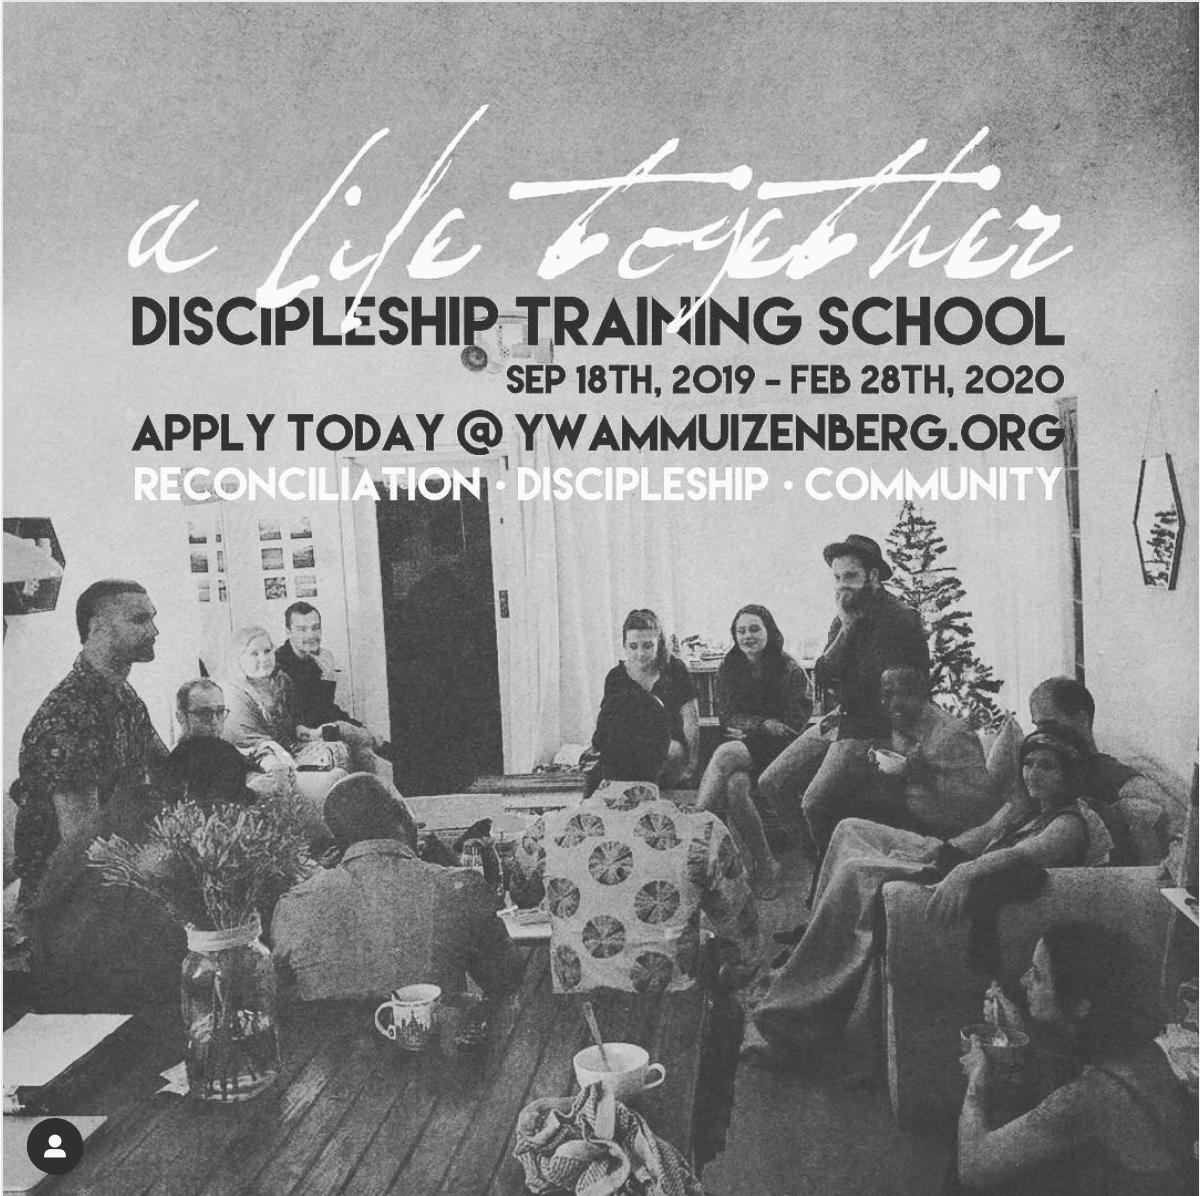 A life together DTS | YWAM Discipleship Training School